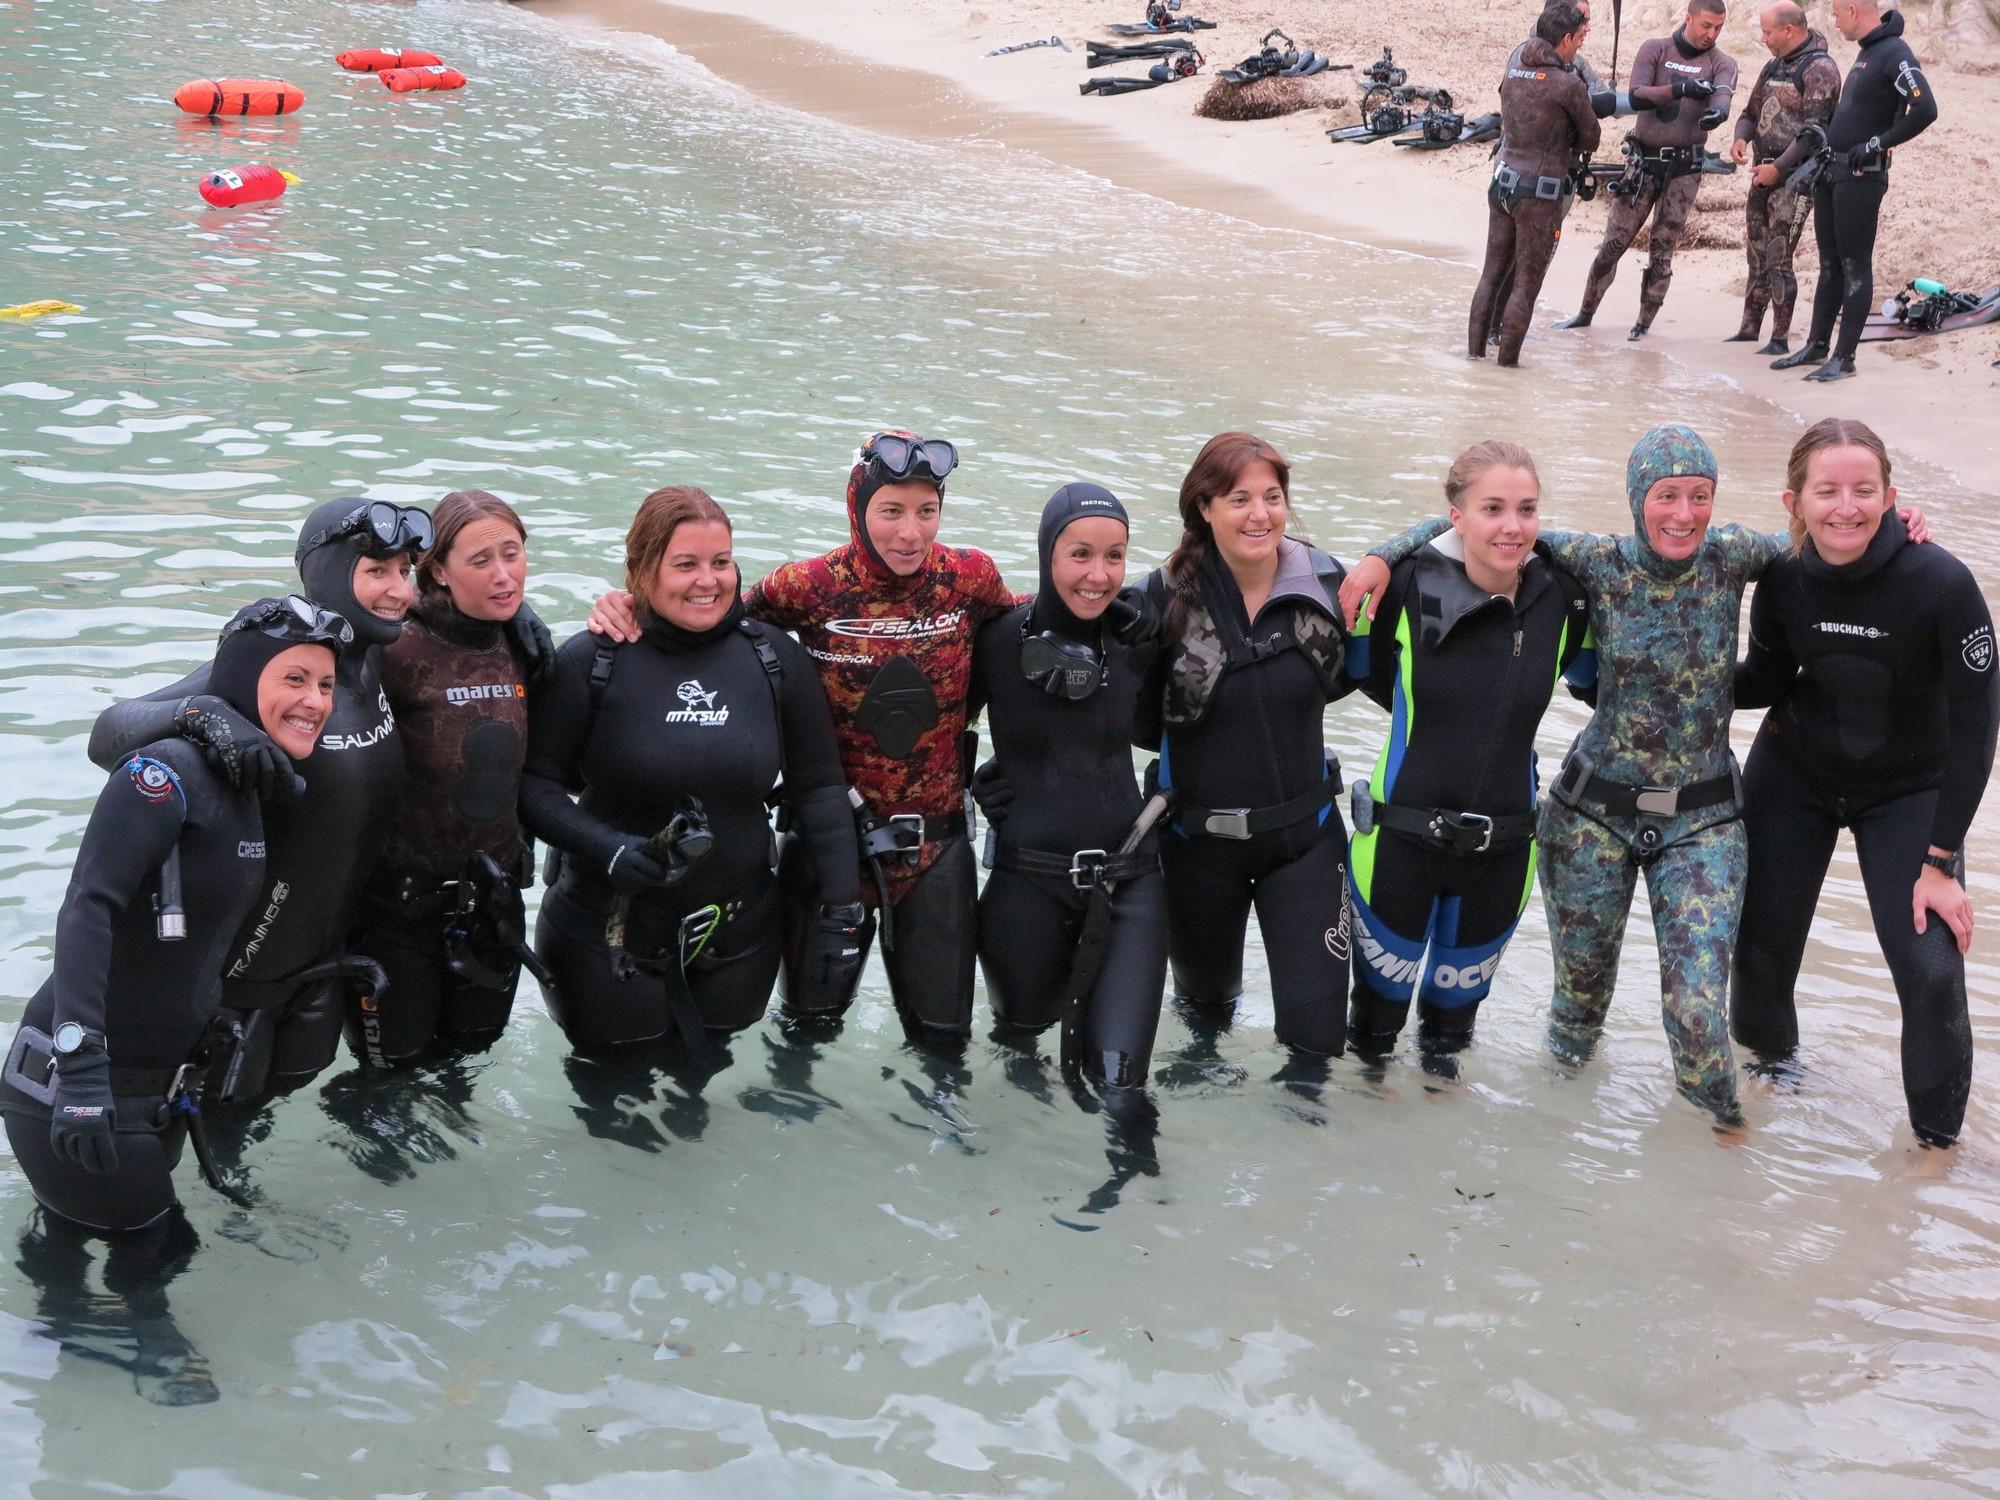 22__Las chicas participantes